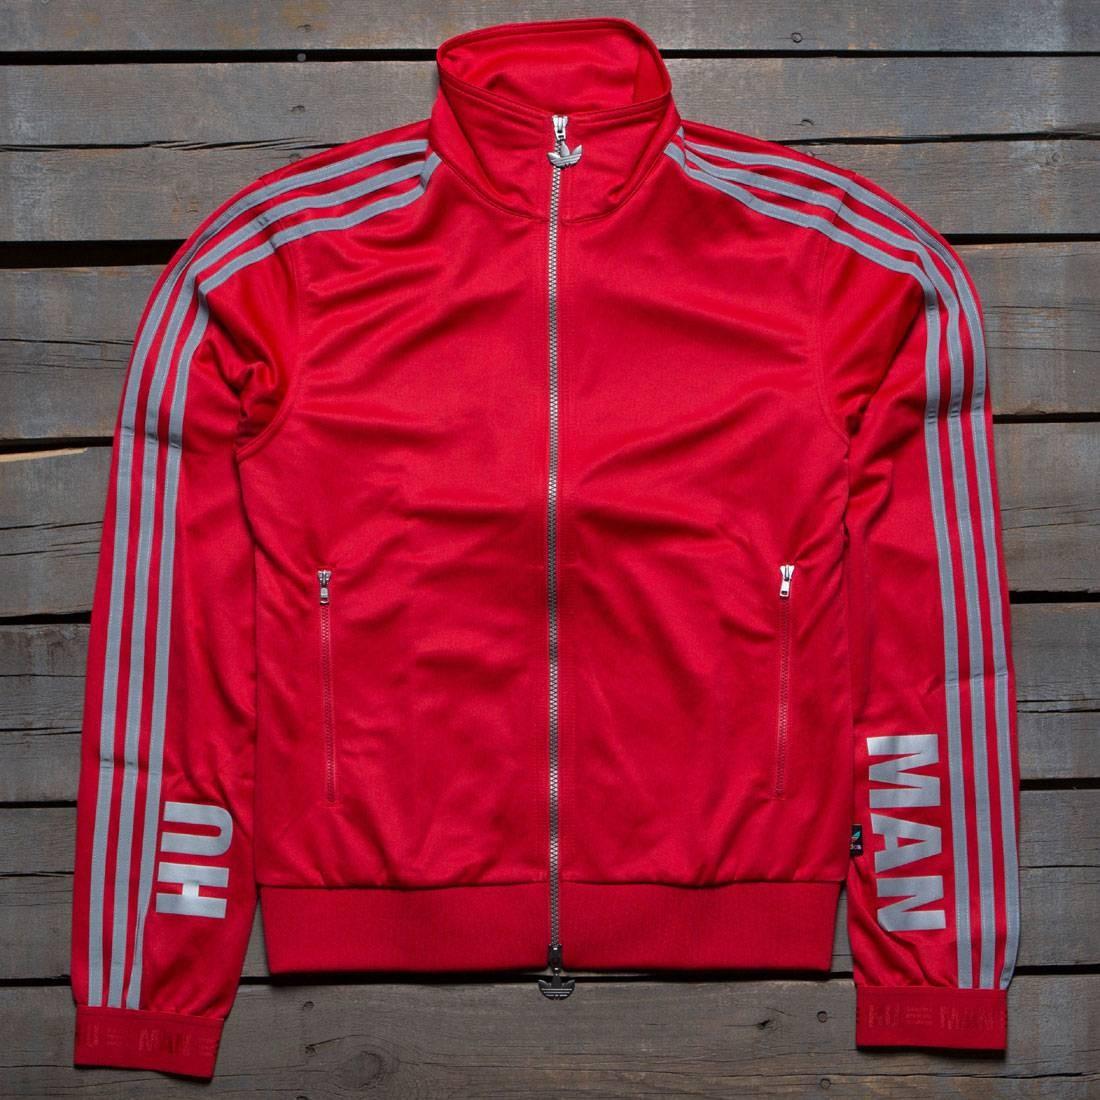 9d4a837a6593d Adidas x Pharrell Williams Men Hu Race Track Jacket red scarlet